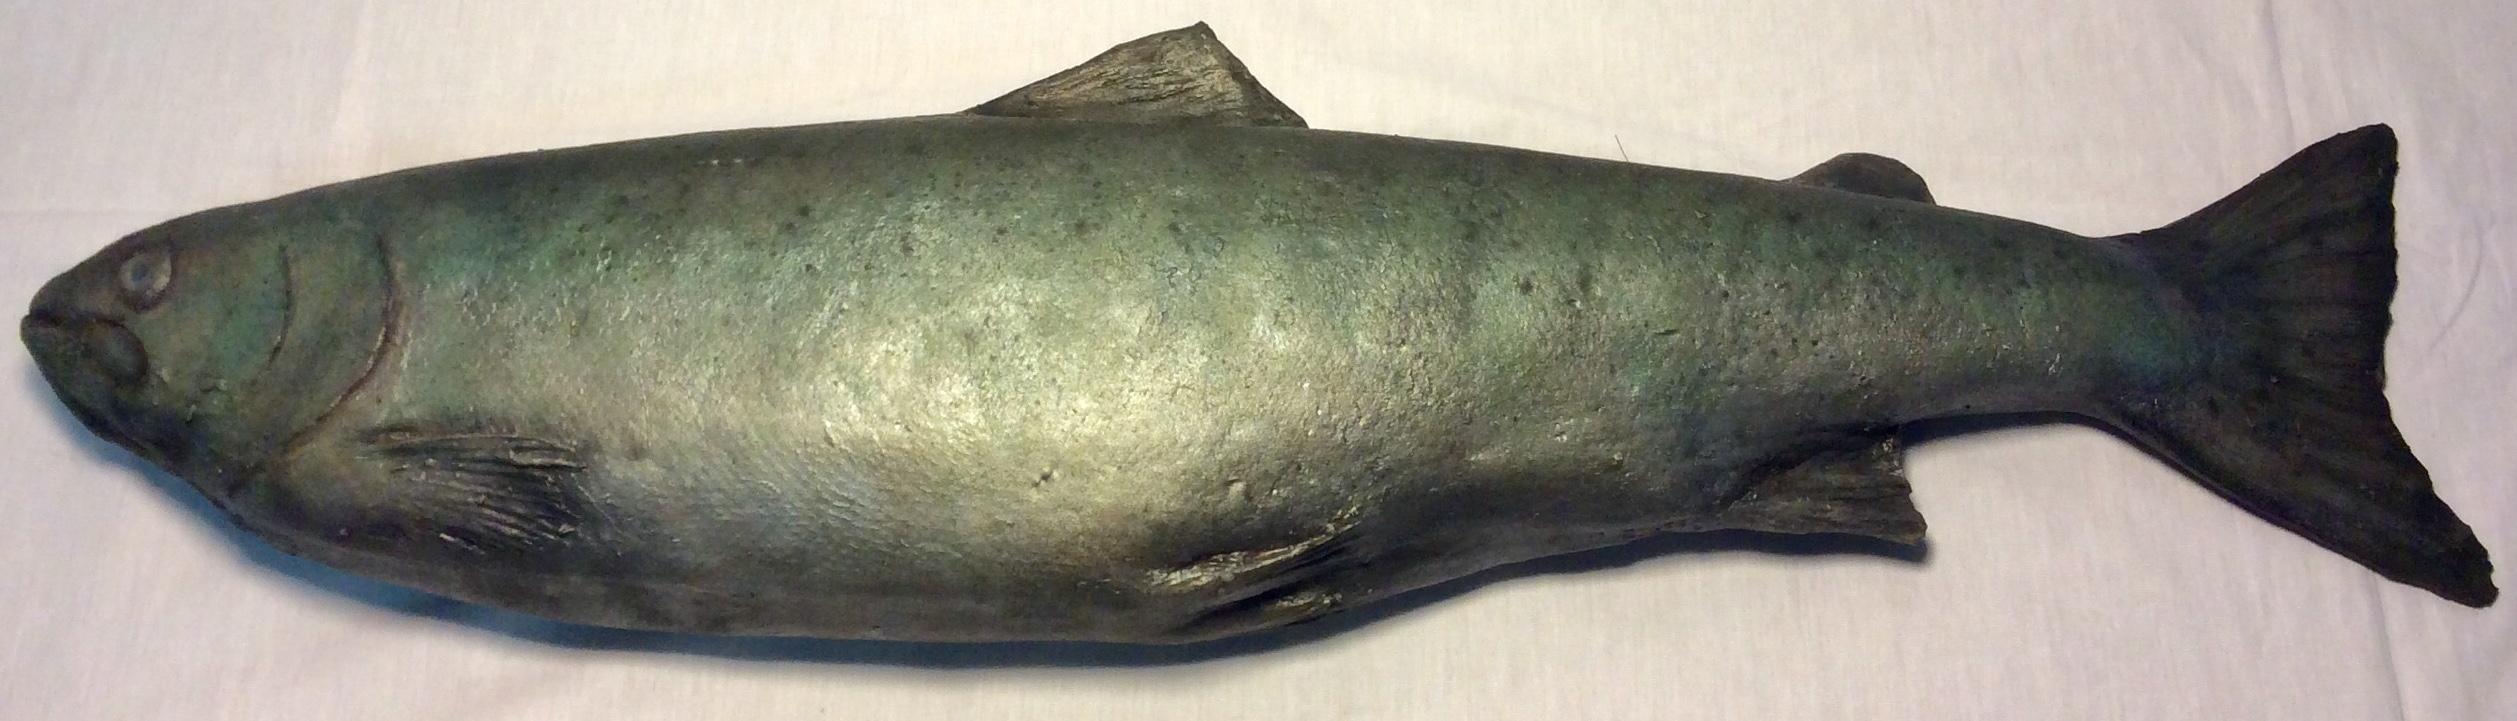 Silicone trout